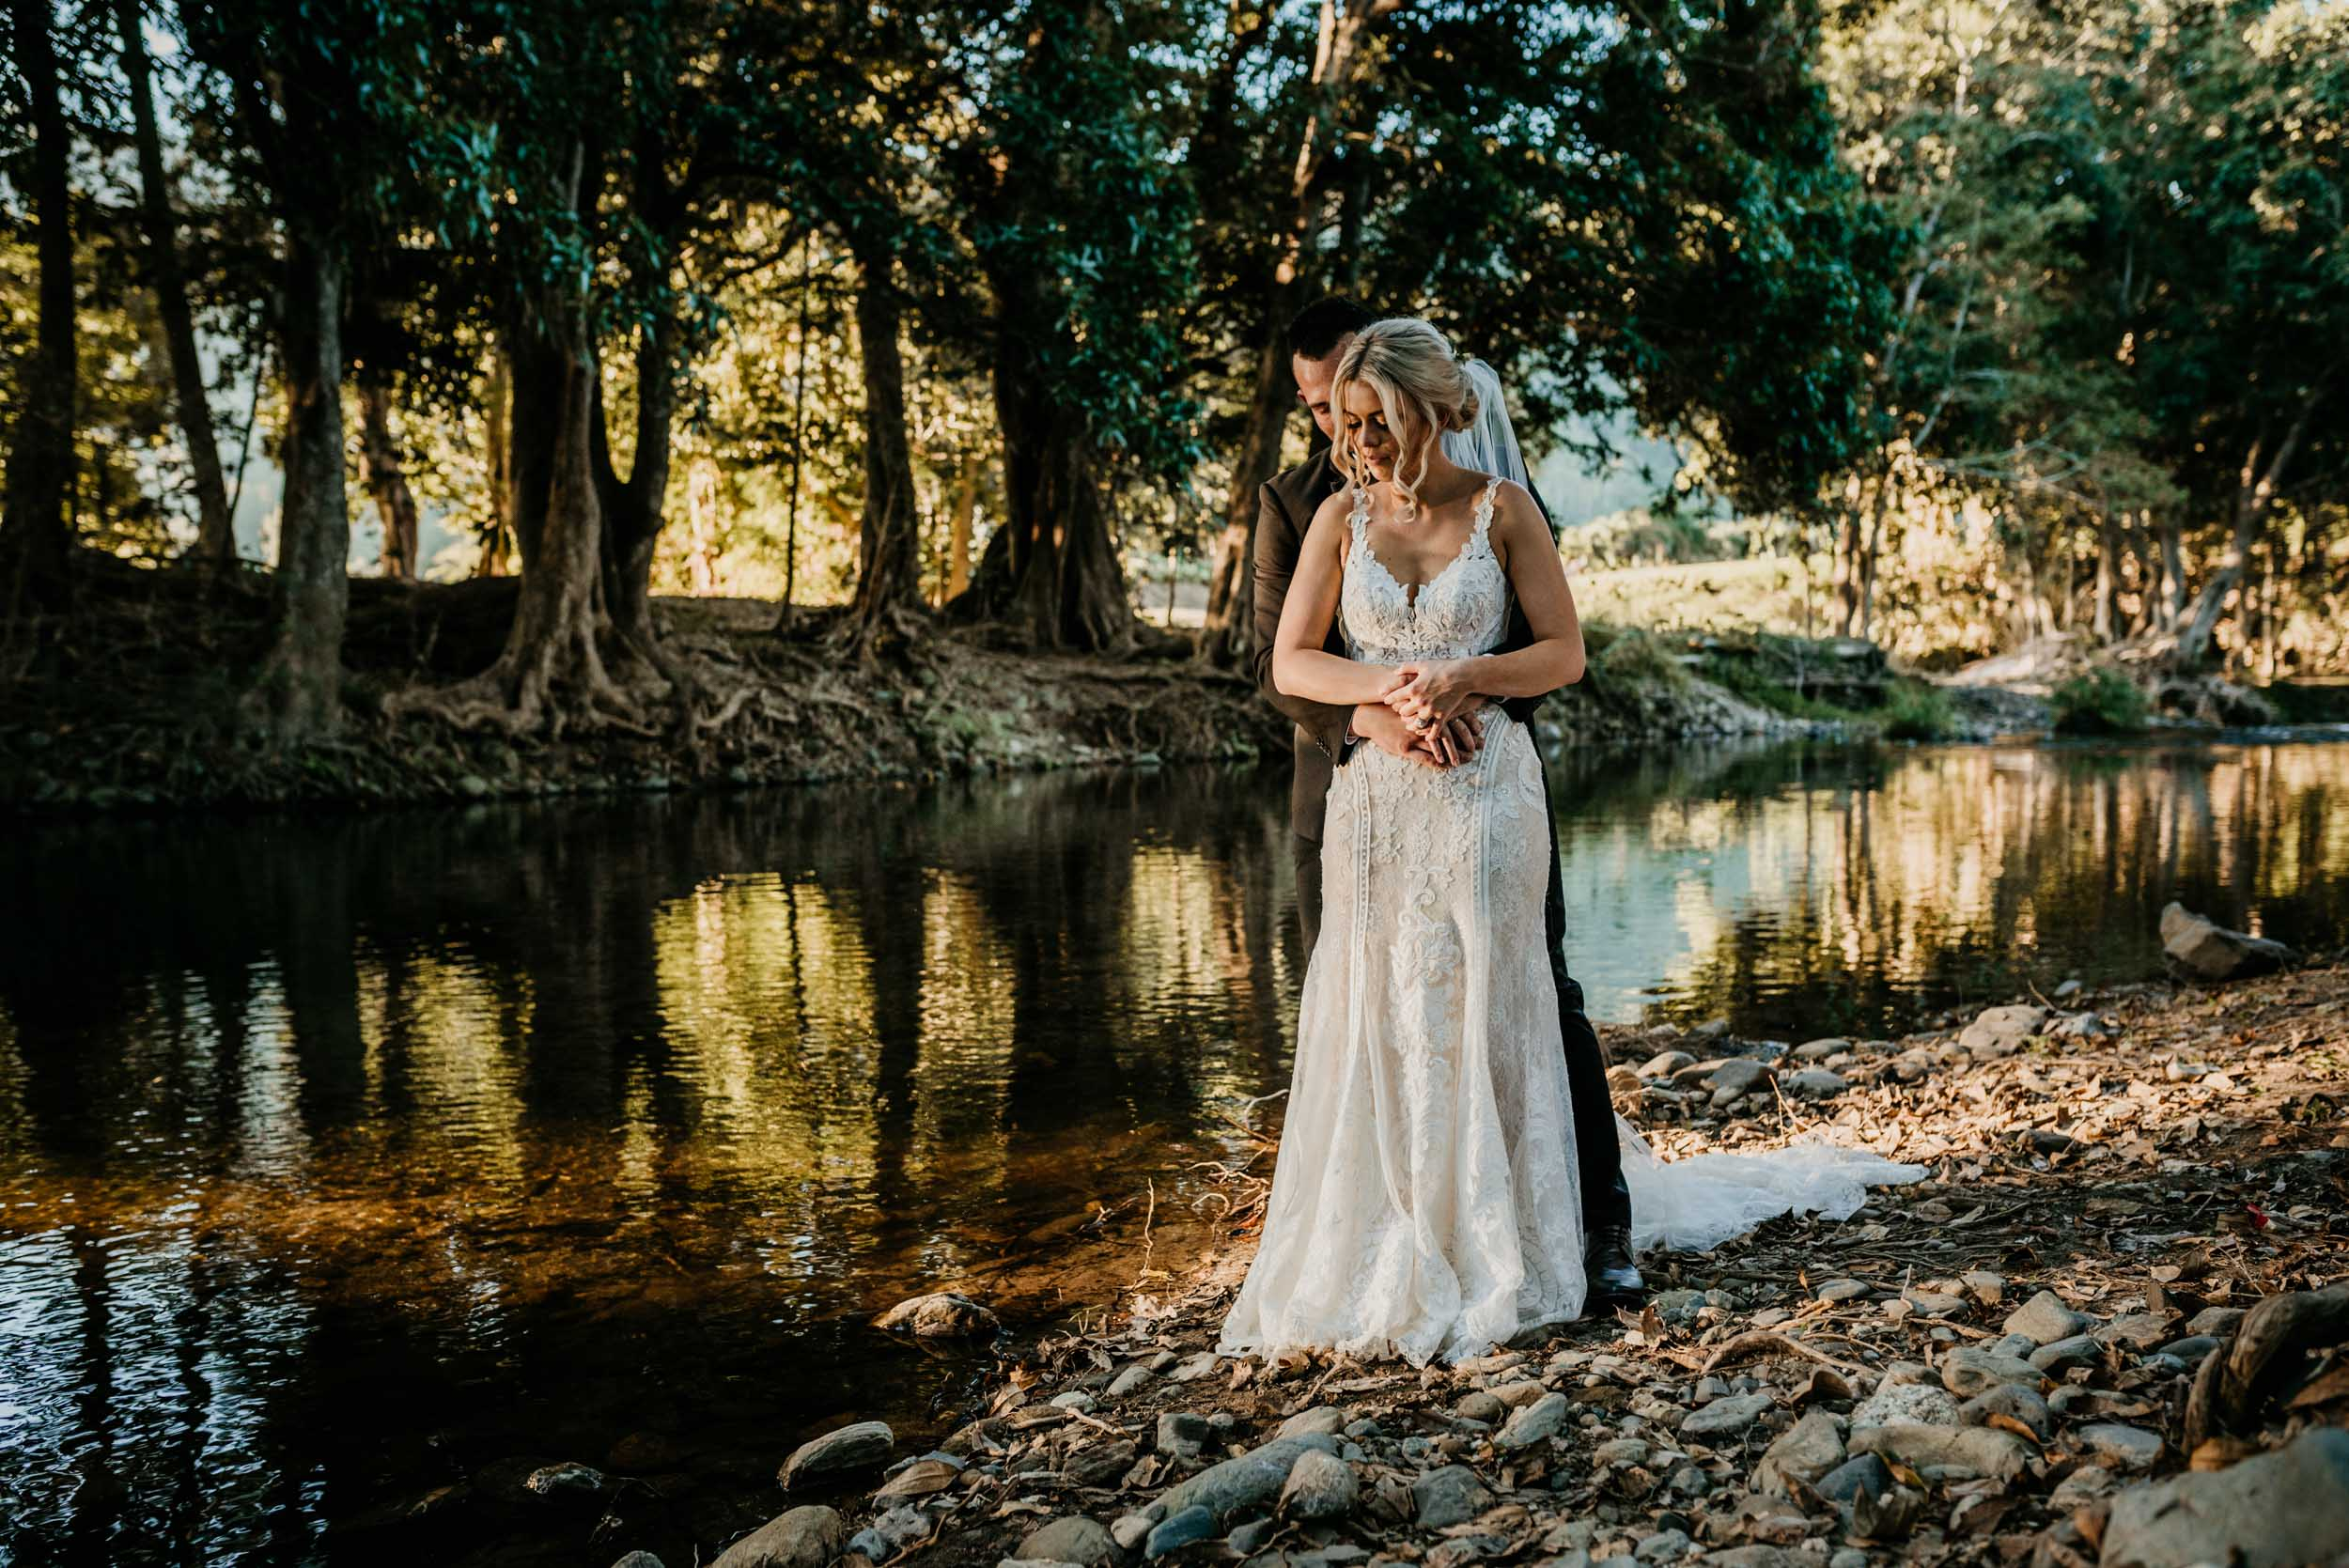 The Raw Photographer - Cairns Wedding Photographer - Laloli - Cairns Garden Wedding - Bride Dress - Destination Wed - Outdoor Reception - Queensland Ceremony-49.jpg